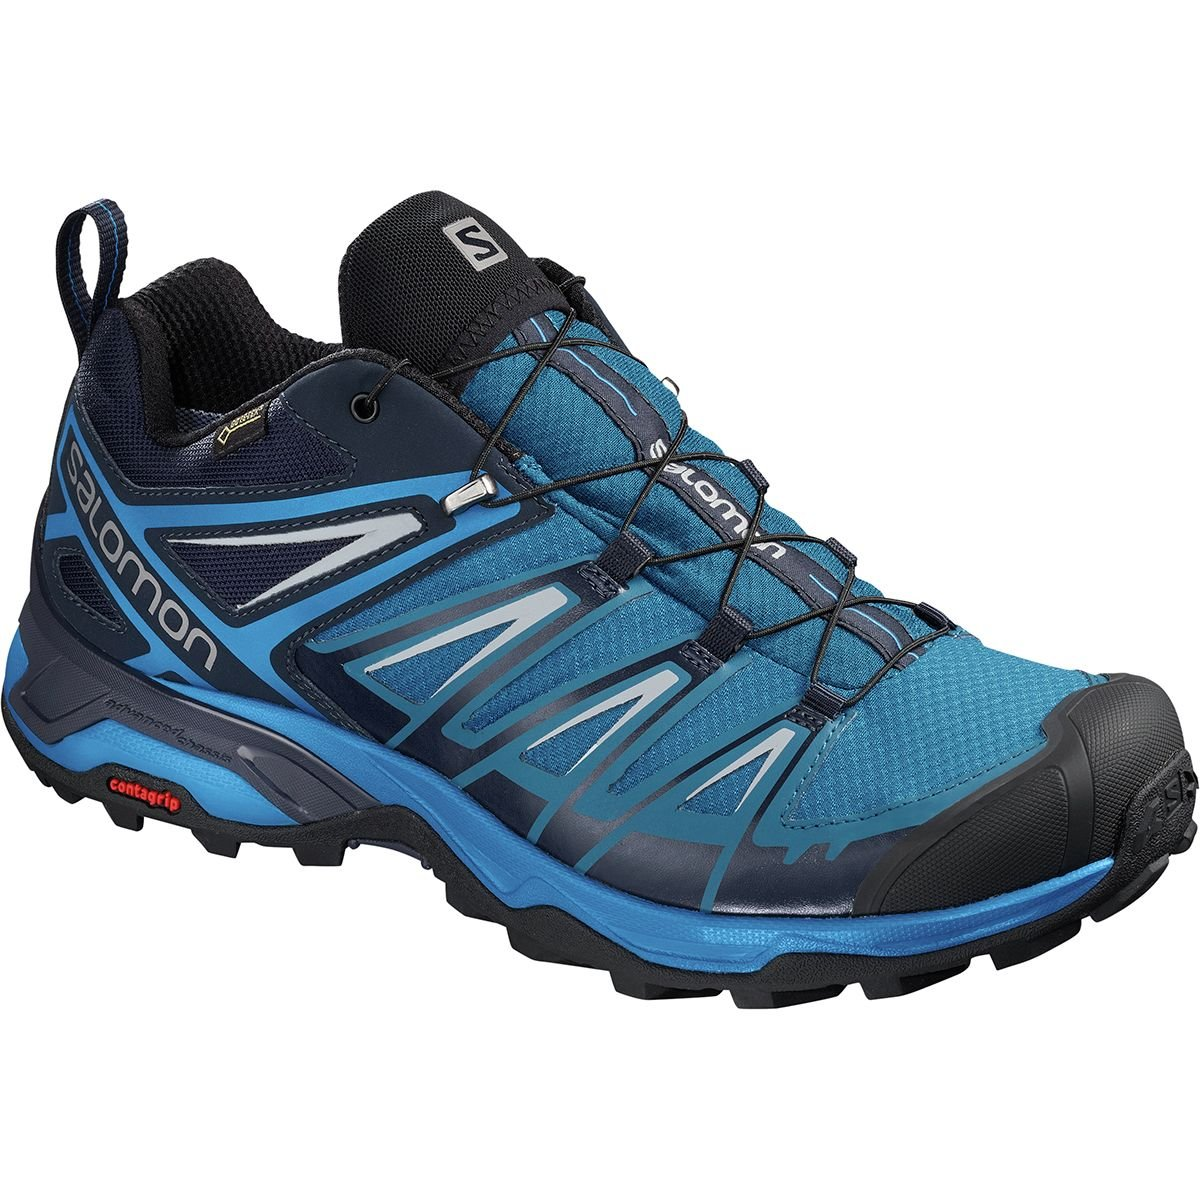 Salomon X Ultra 3 GTX Hiking Shoe - Men's Mykonos Blue/Indigo Bunting/Pearl Blue, US 10.0/UK 9.5